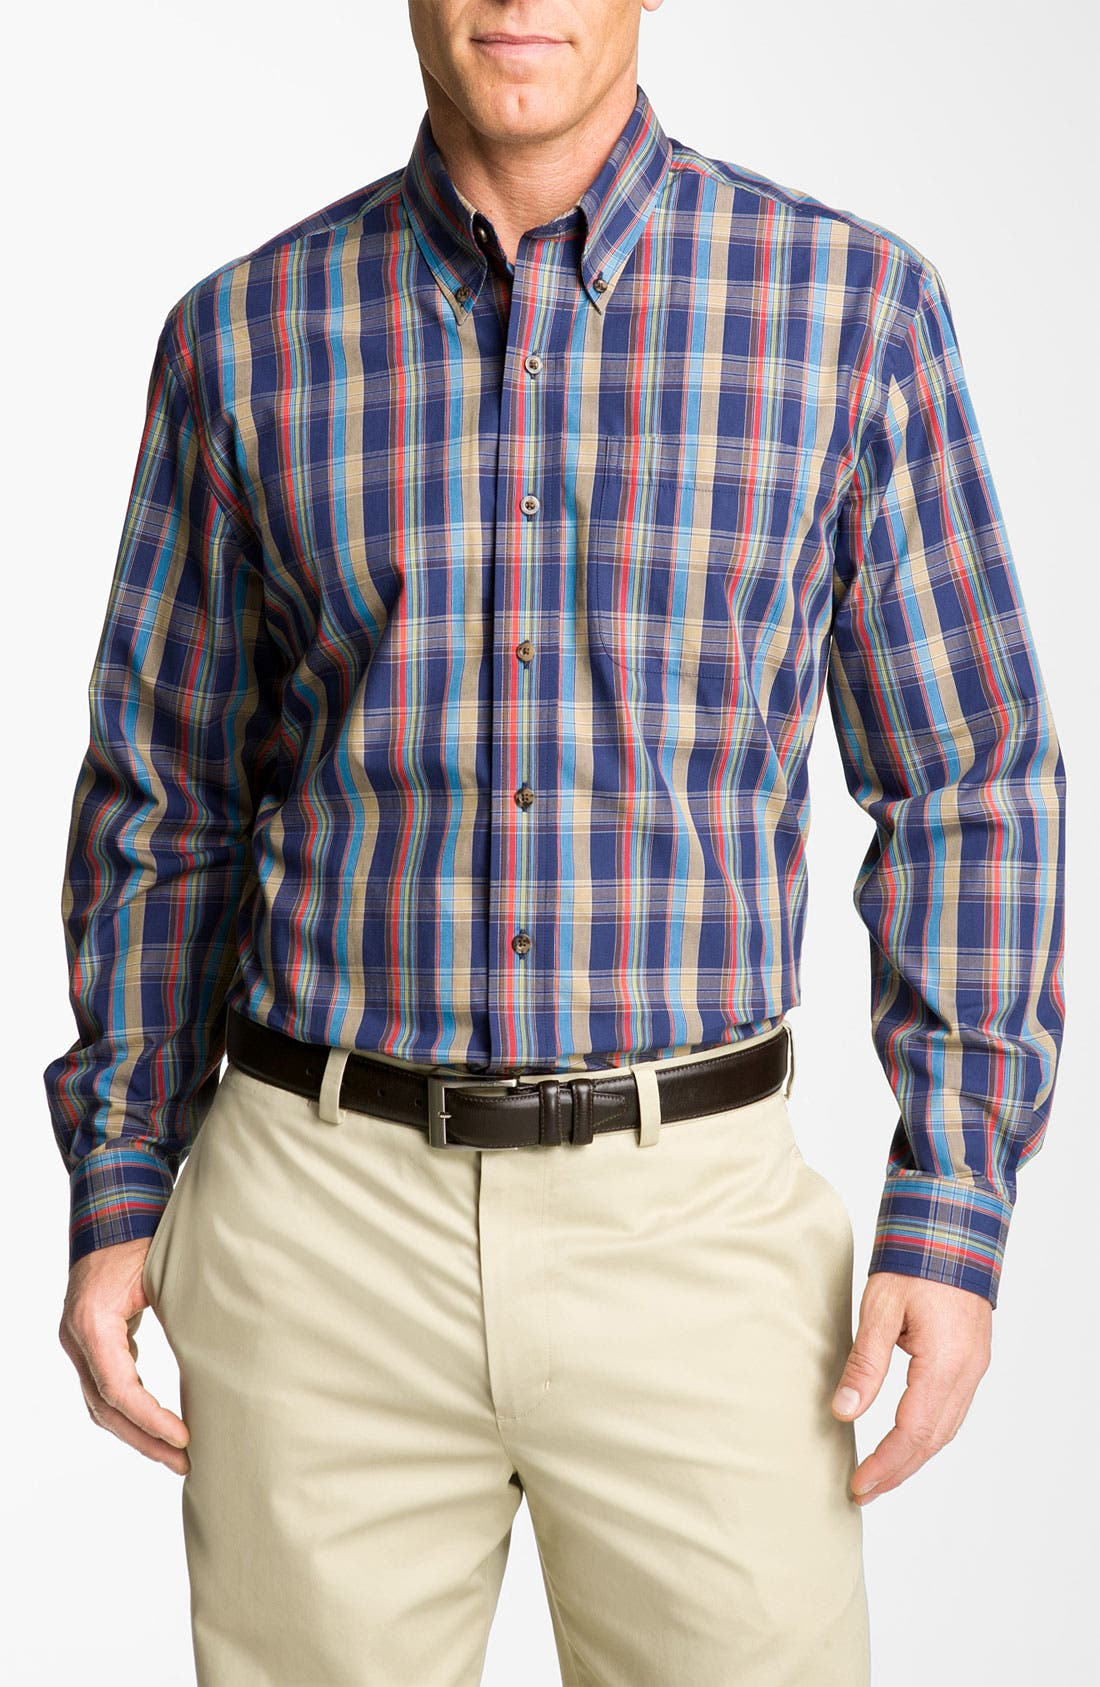 Main Image - Cutter & Buck 'Palouse' Plaid Sport Shirt (Big & Tall)